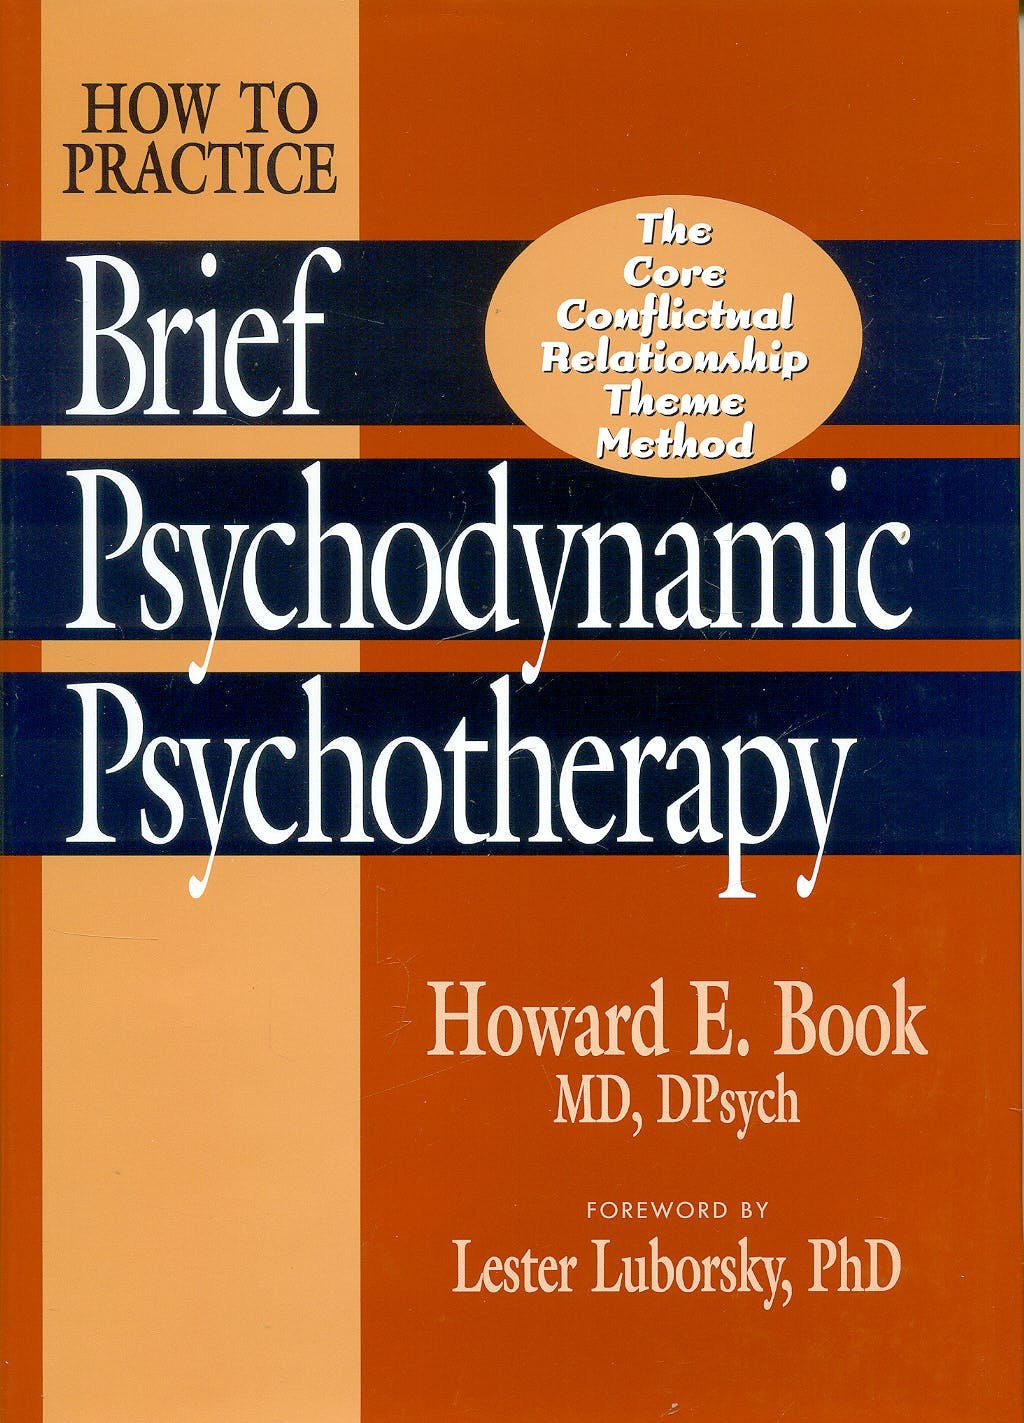 Portada del libro 9781557984654 How to Practice Brief Psychodynamic Psychotherapy: Core Conflictual Relationship Theme Method